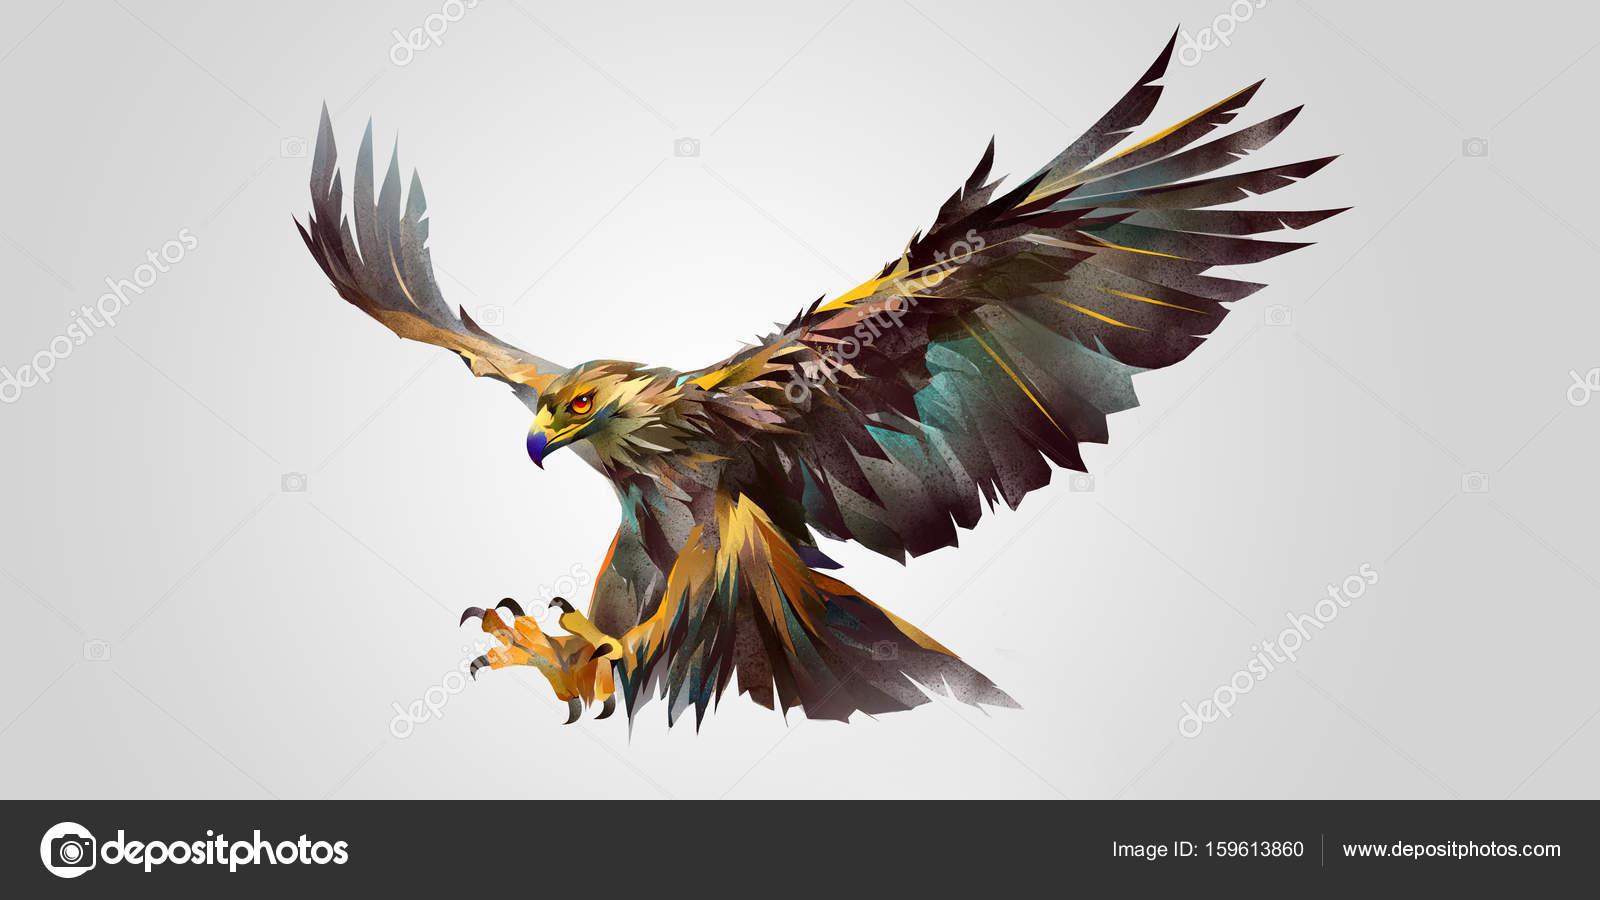 Painted attacking bird eagle — Stock Photo © khius #159613860